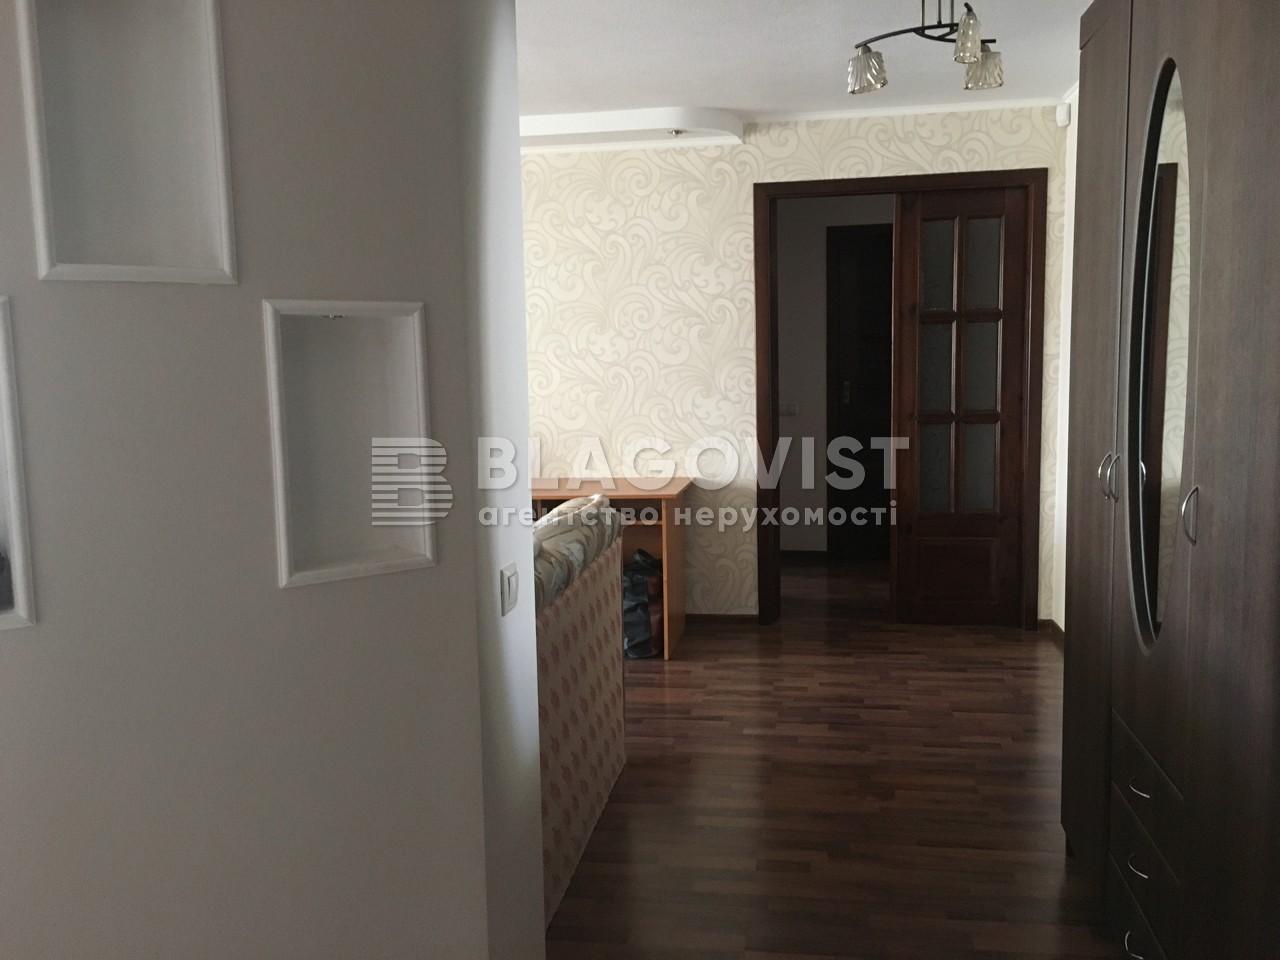 Квартира Z-213120, Автозаводская, 5а, Киев - Фото 16